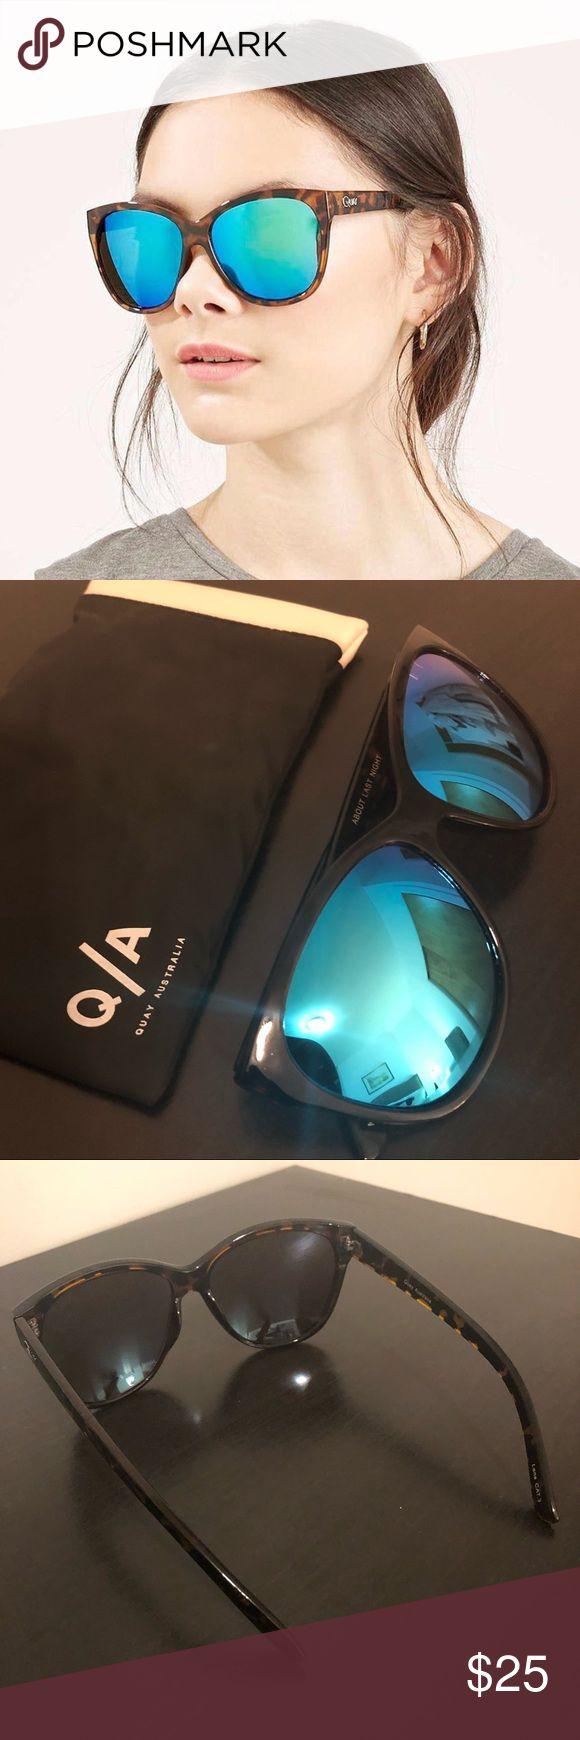 New Quay Australia sunglasses Tortoise shell frame with blue mirrored lenses Quay Australia Accessories Sunglasses